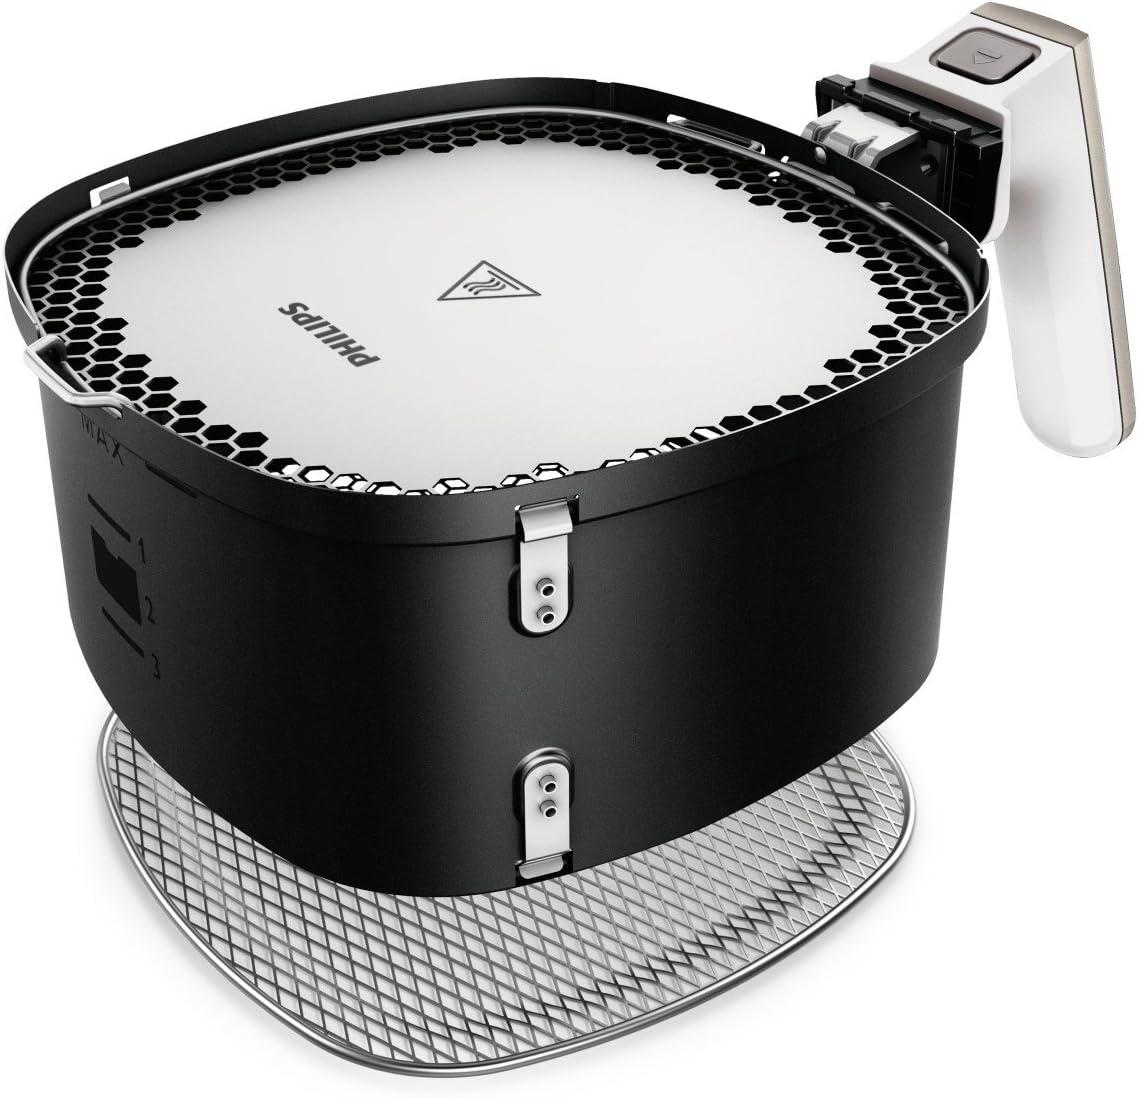 Philips Kitchen Appliances Philips HD9980 50 Variety, White Air fryer Accessory Basket